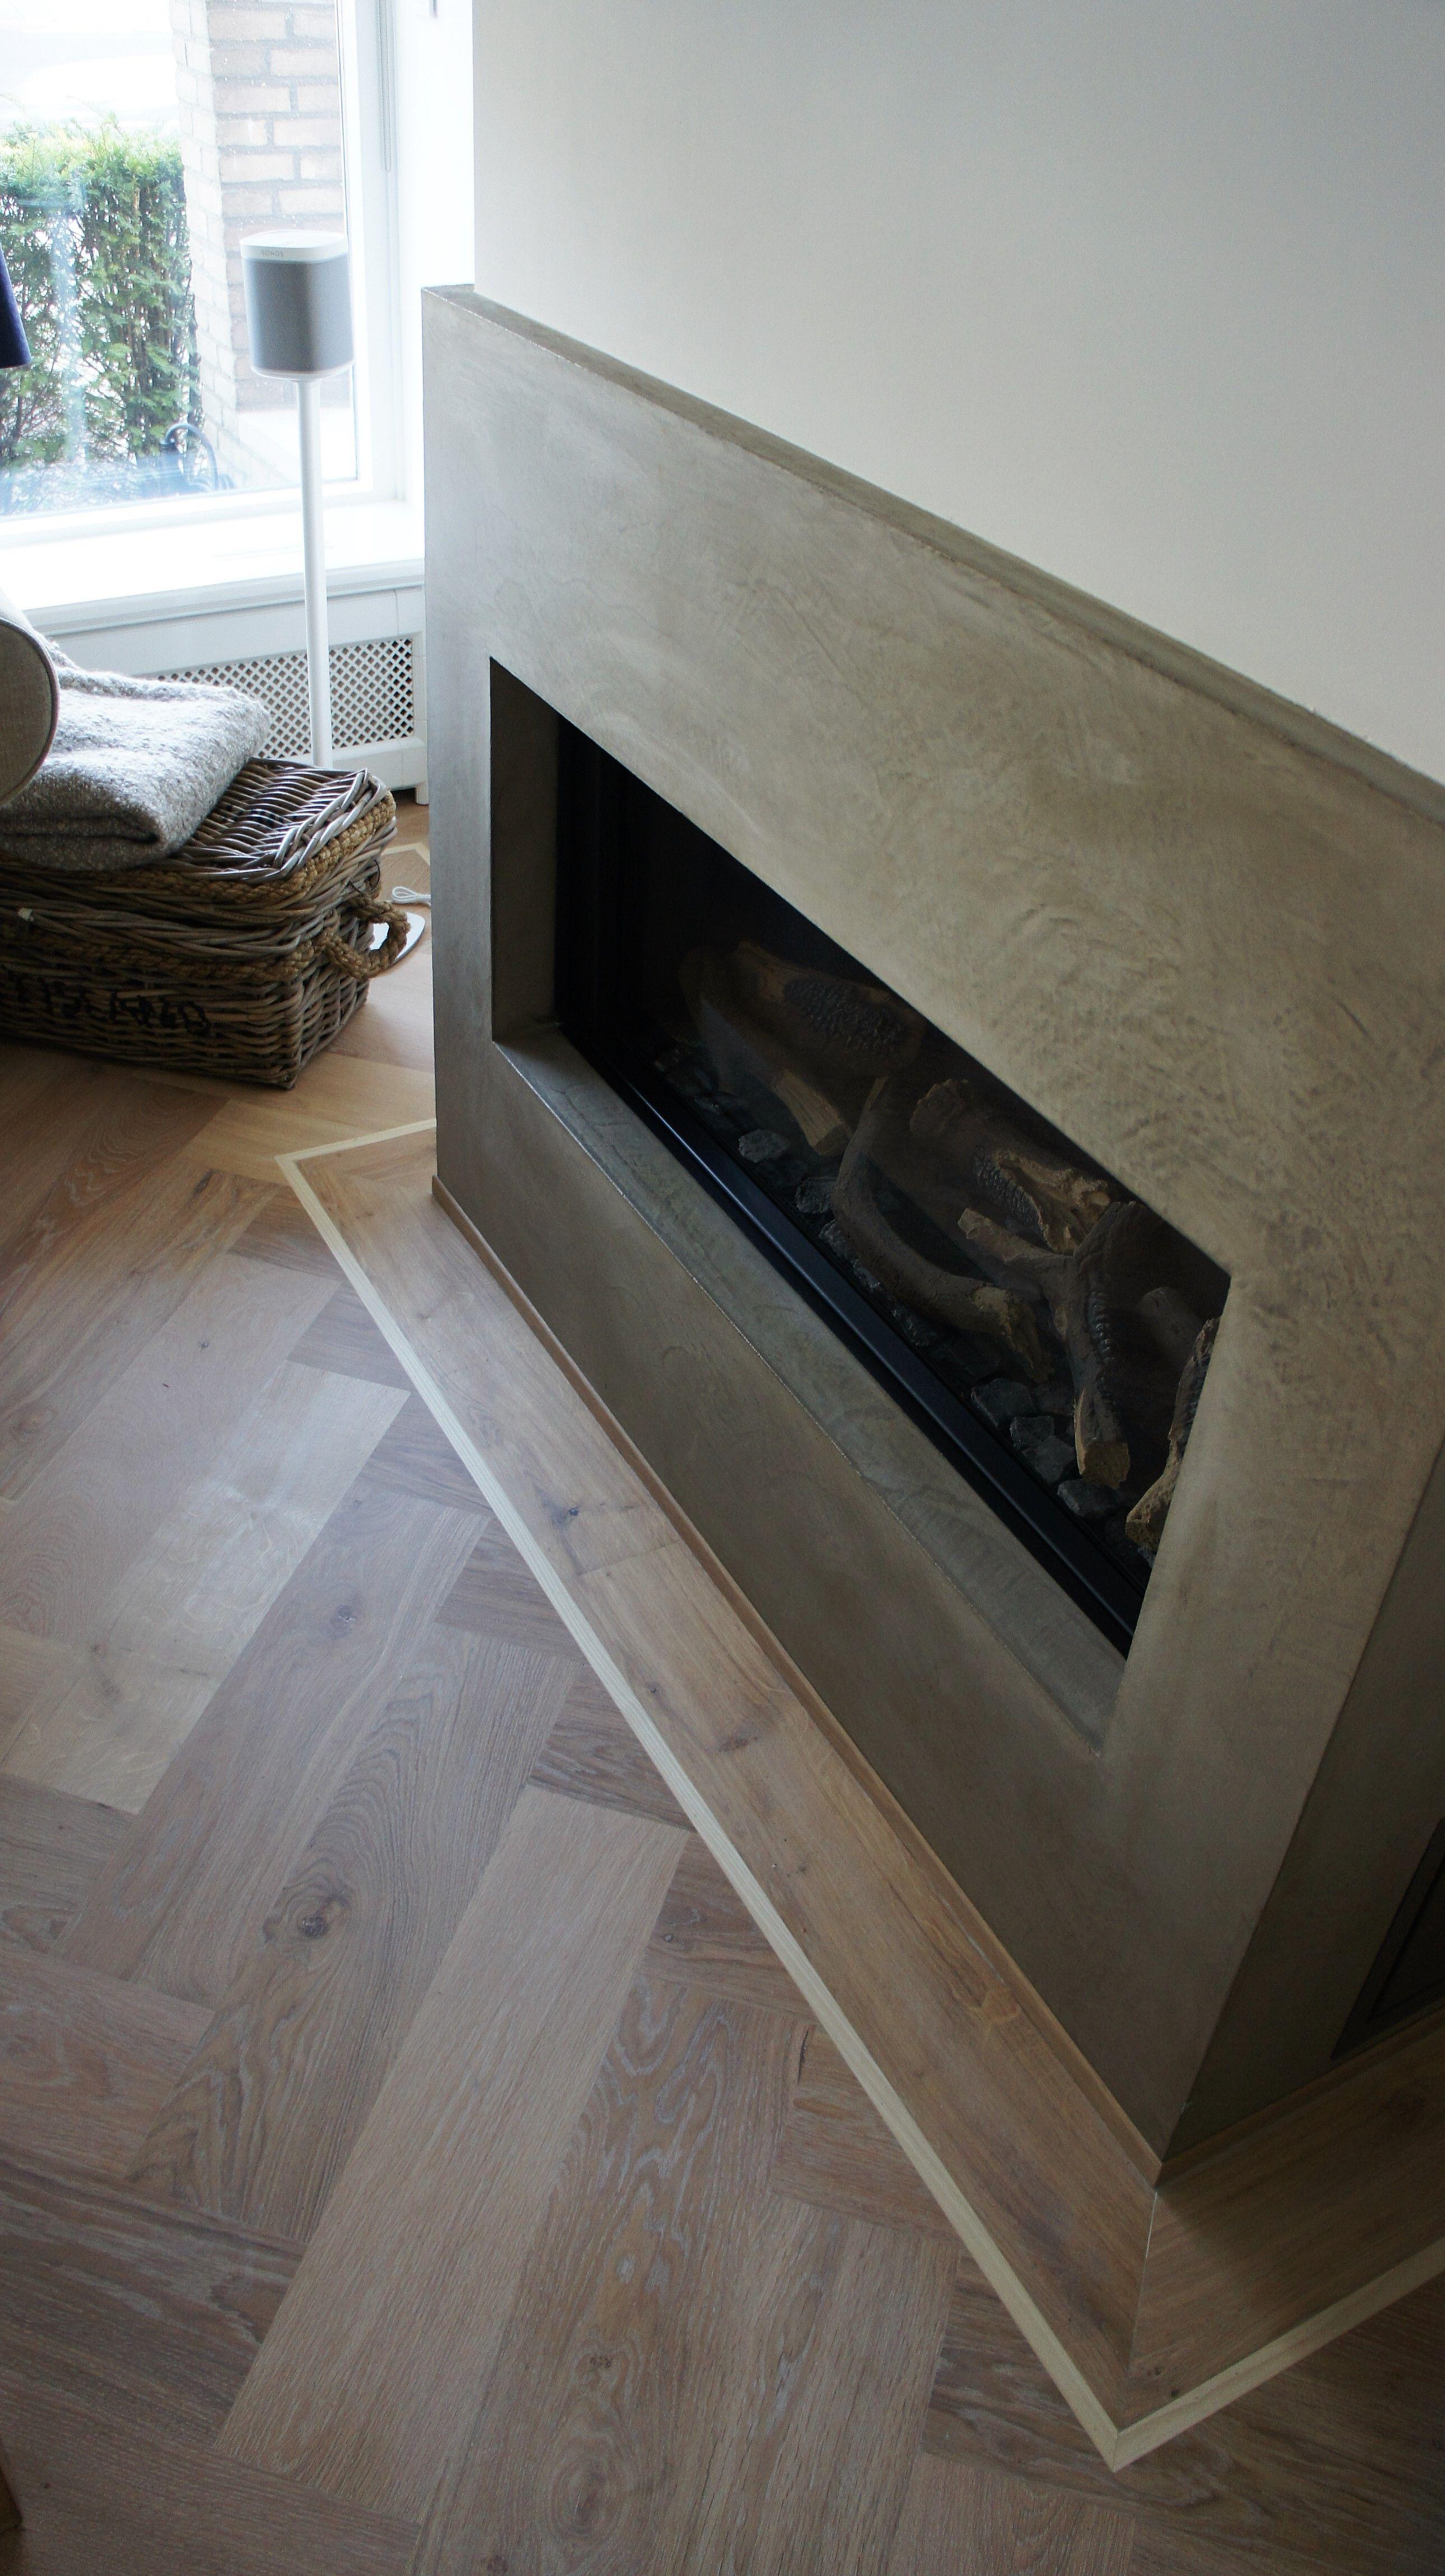 morefloors vloeren breda europees eiken tapis visgraat vloer 8 x